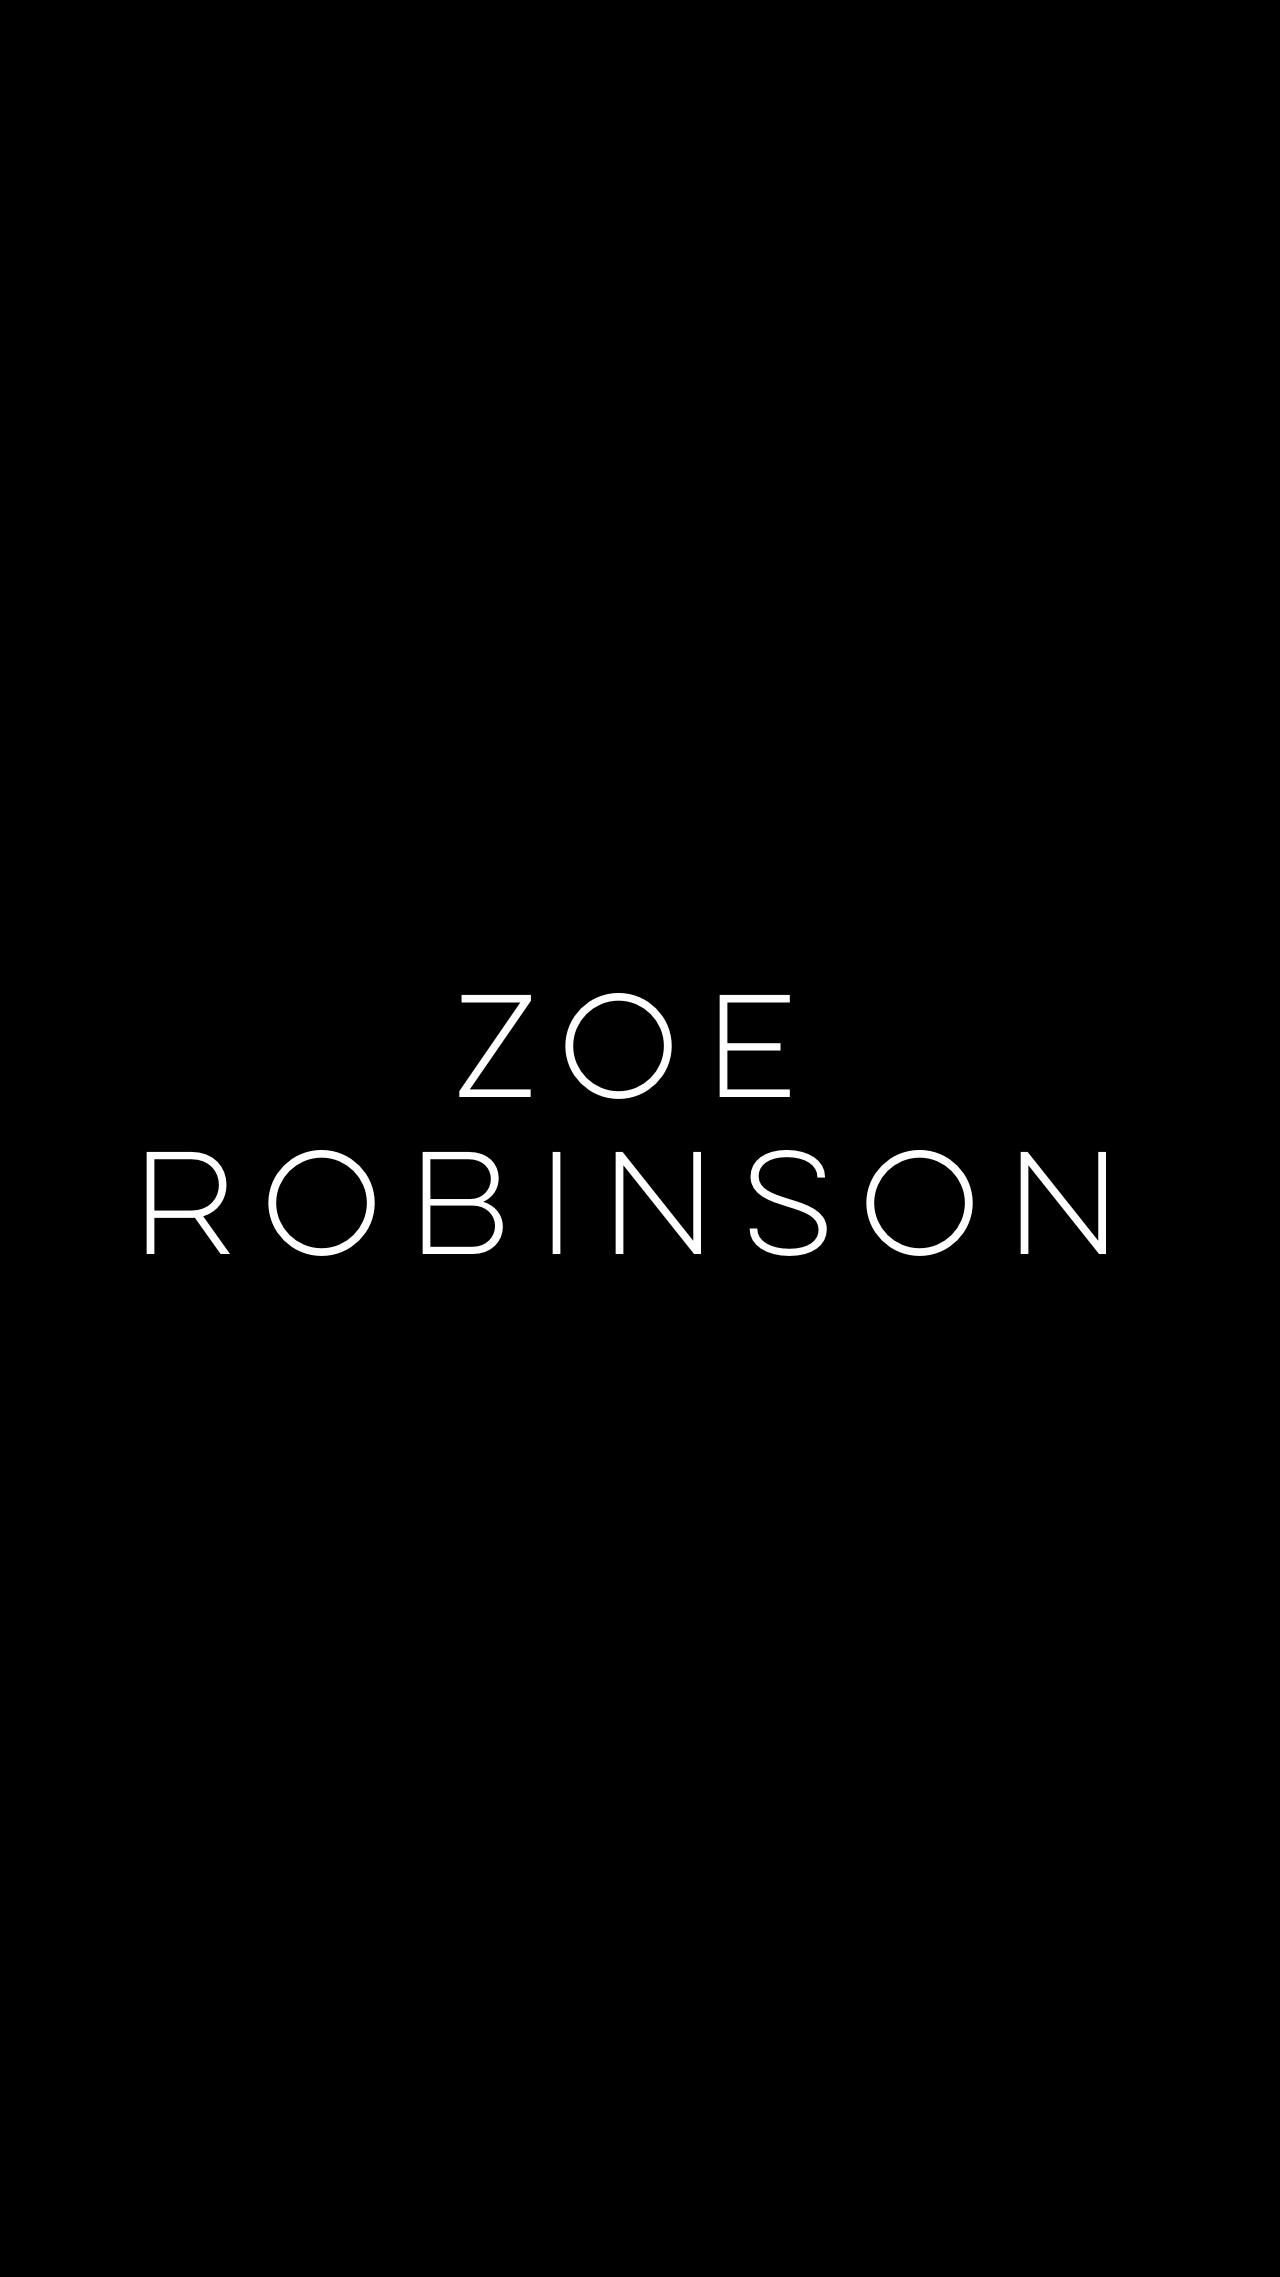 ZOE ROBINSON.jpg